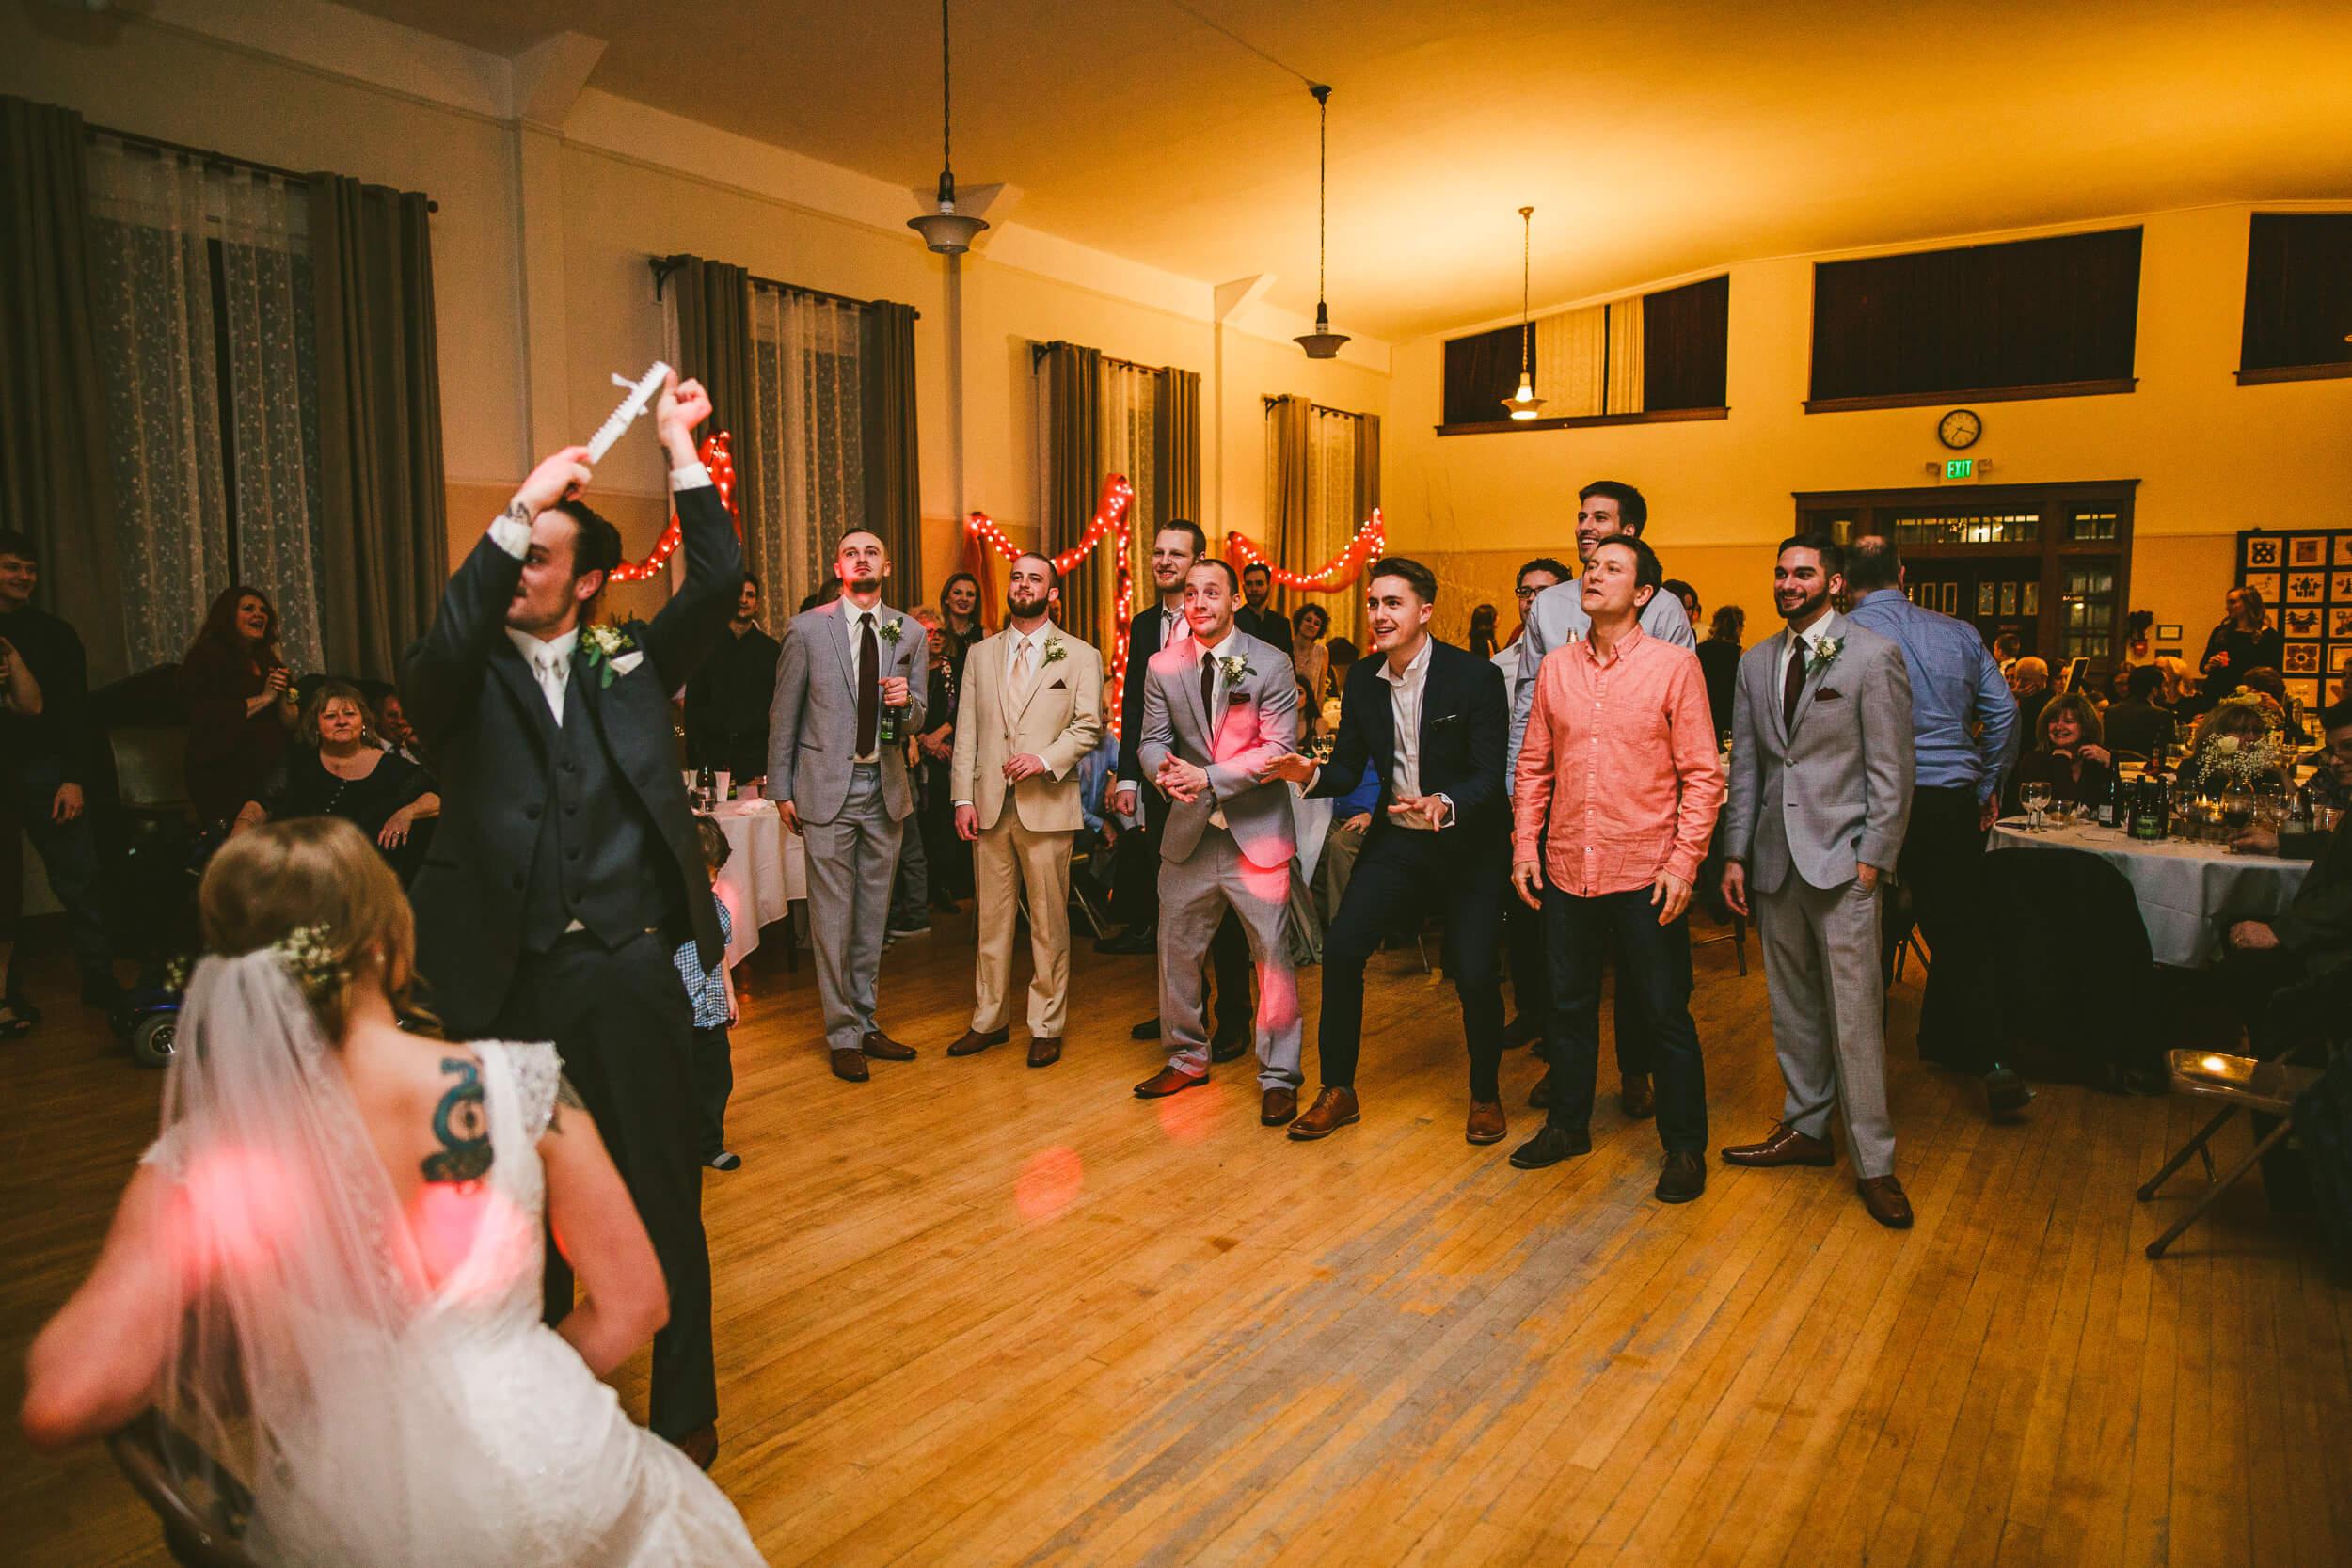 mukogawa winter wedding in spokane (339).jpg